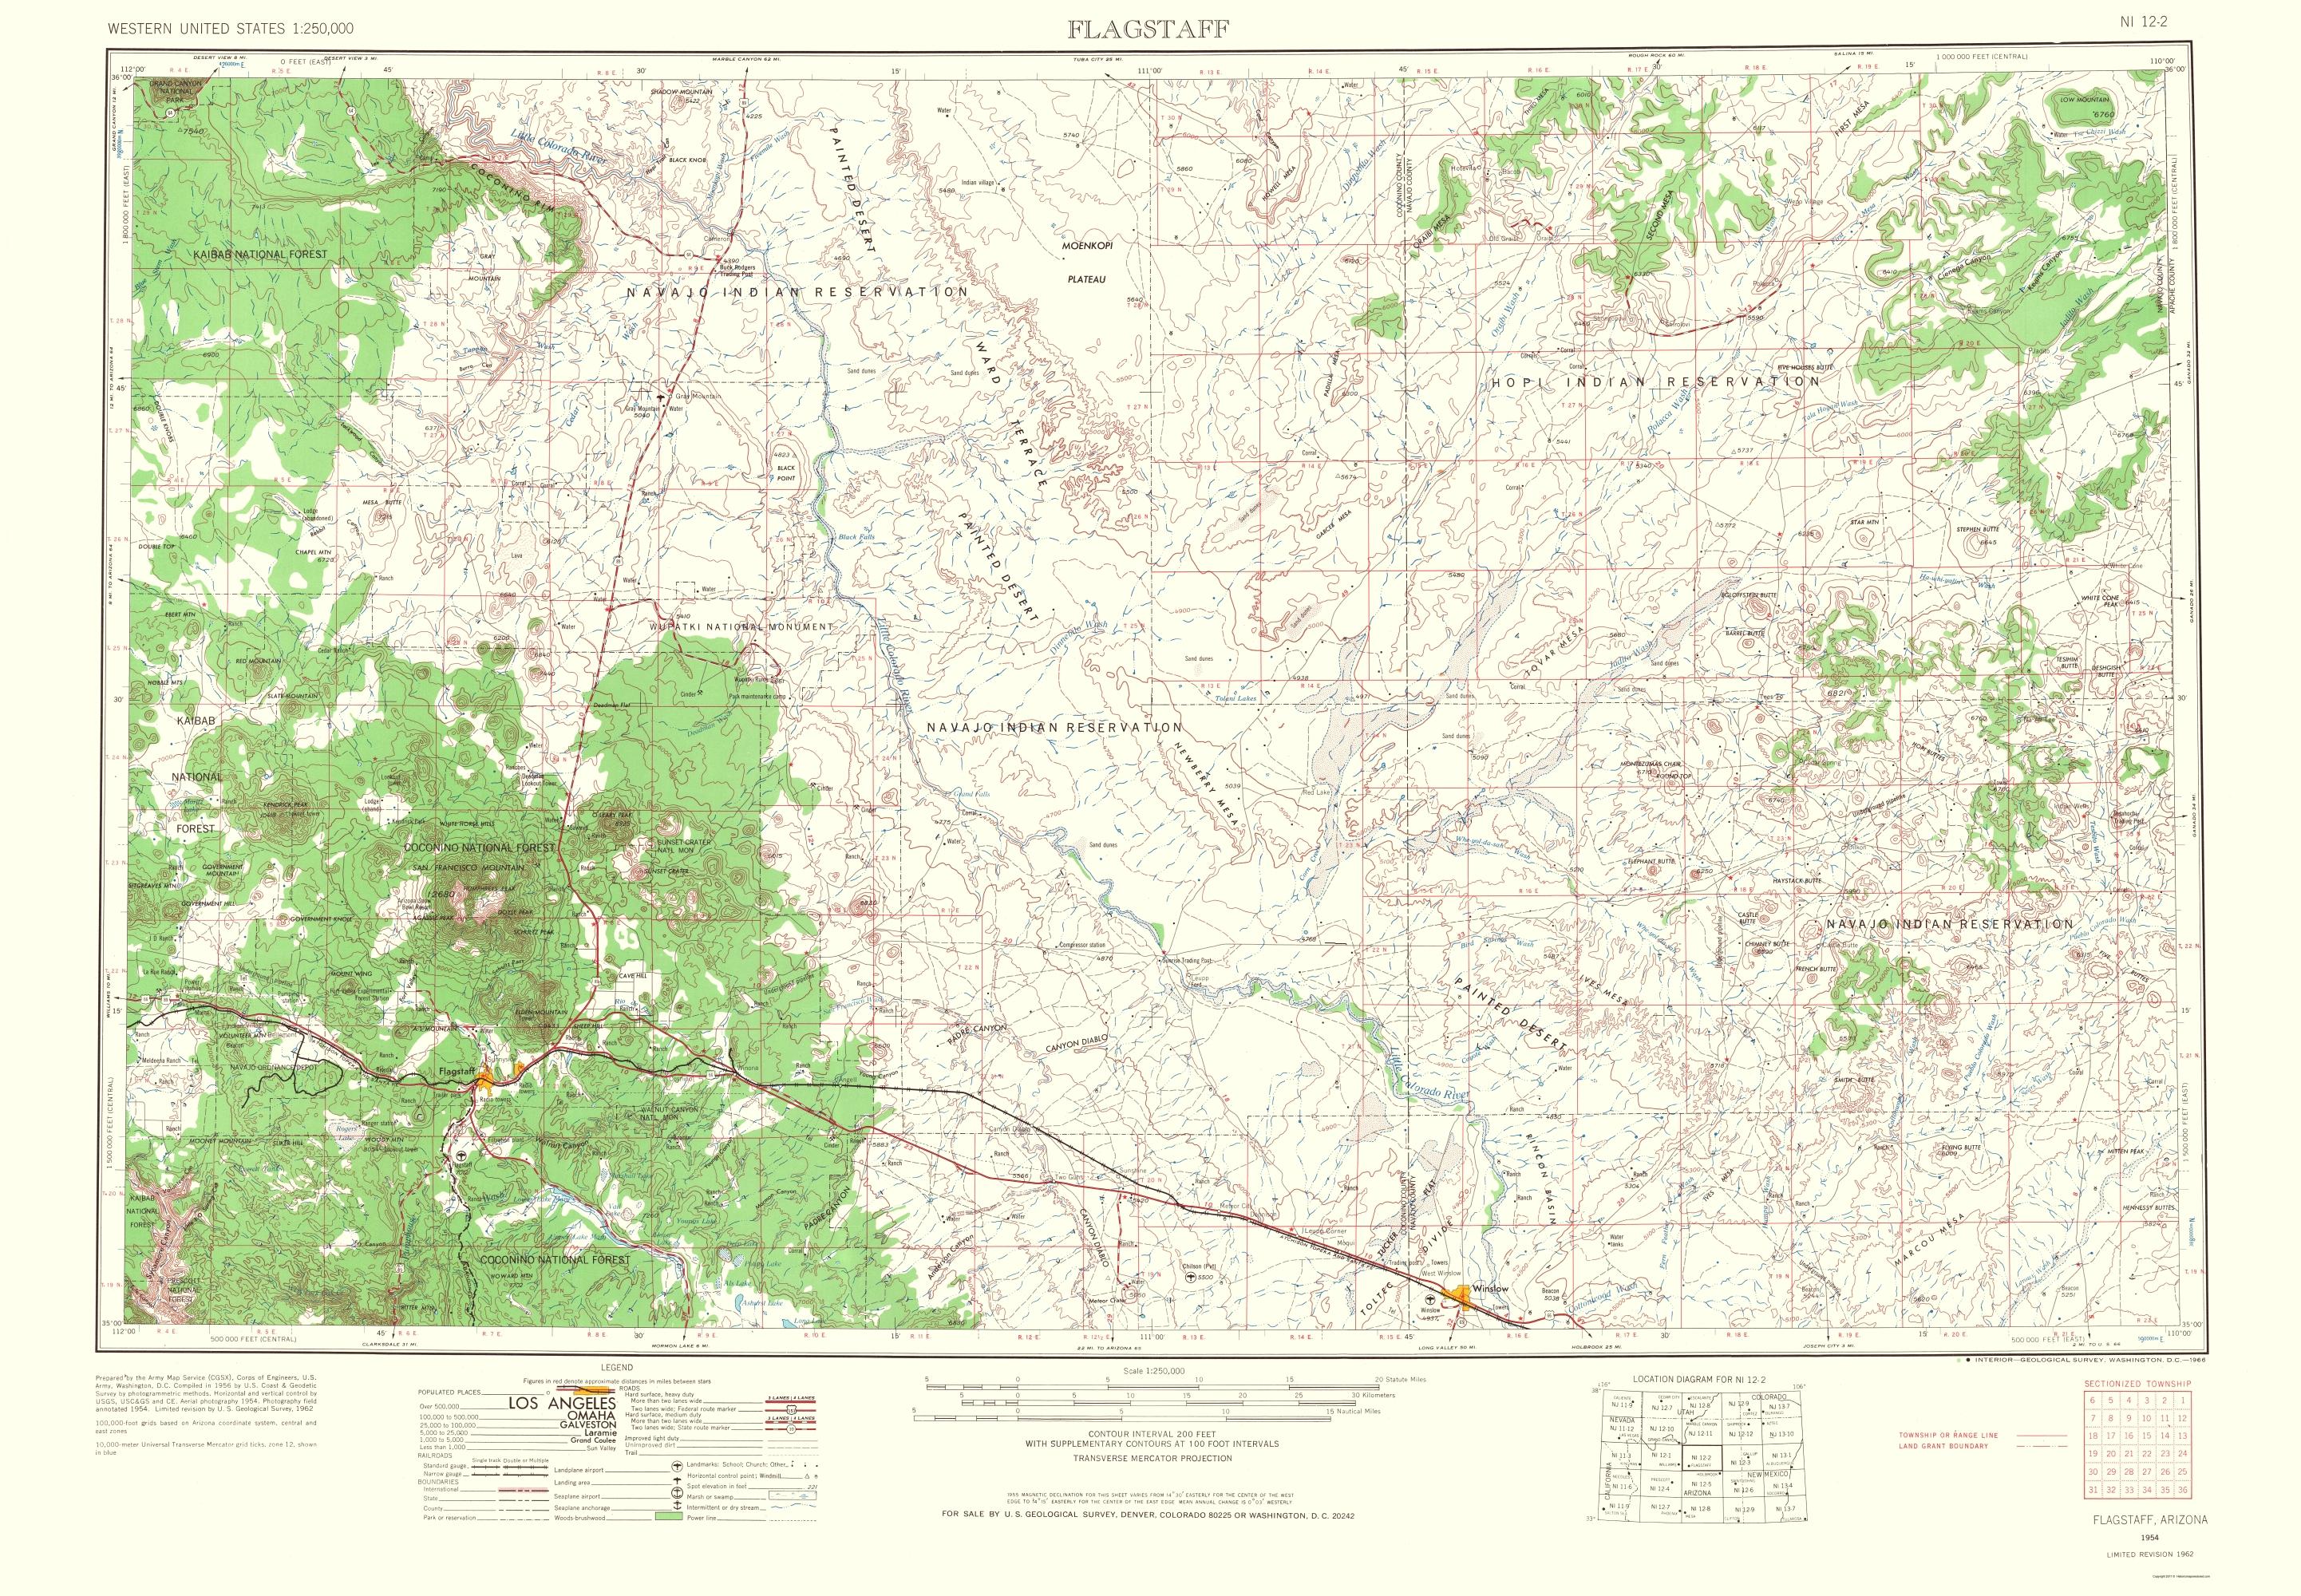 Old Topographical Map Flagstaff Arizona 1966